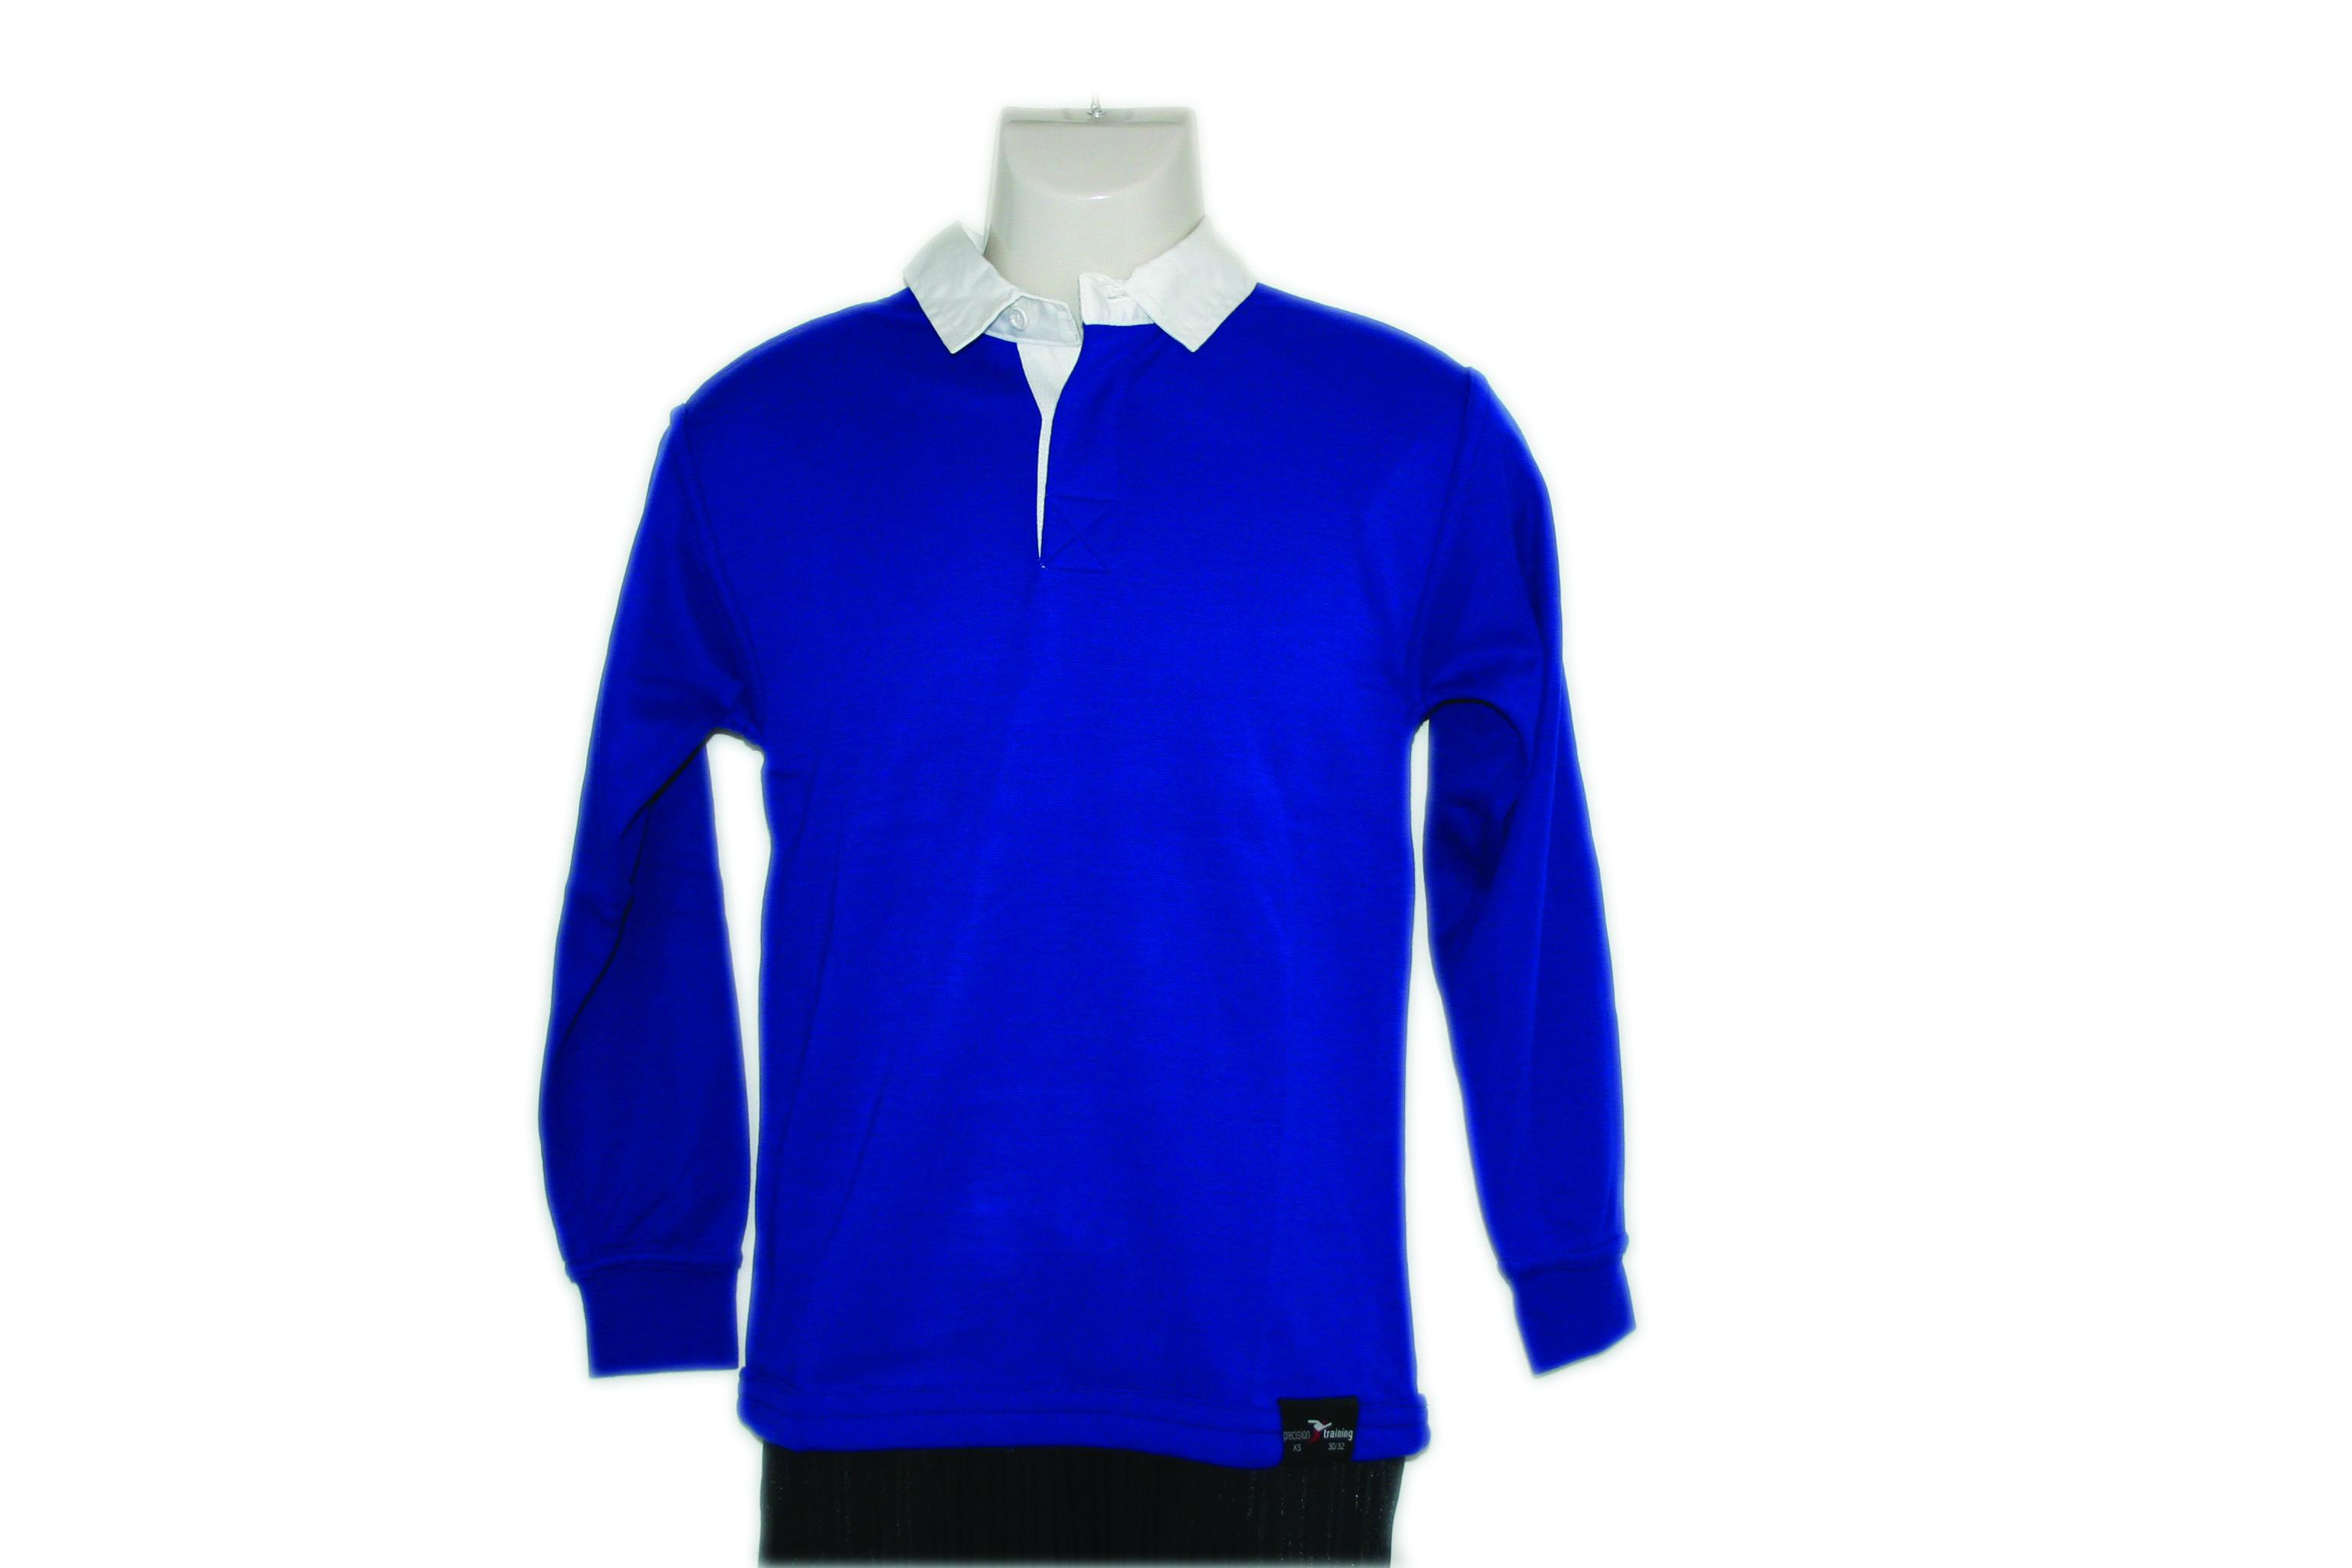 penglais rugby shirts £ 12 95 £ 16 95 penglais rugby shirts